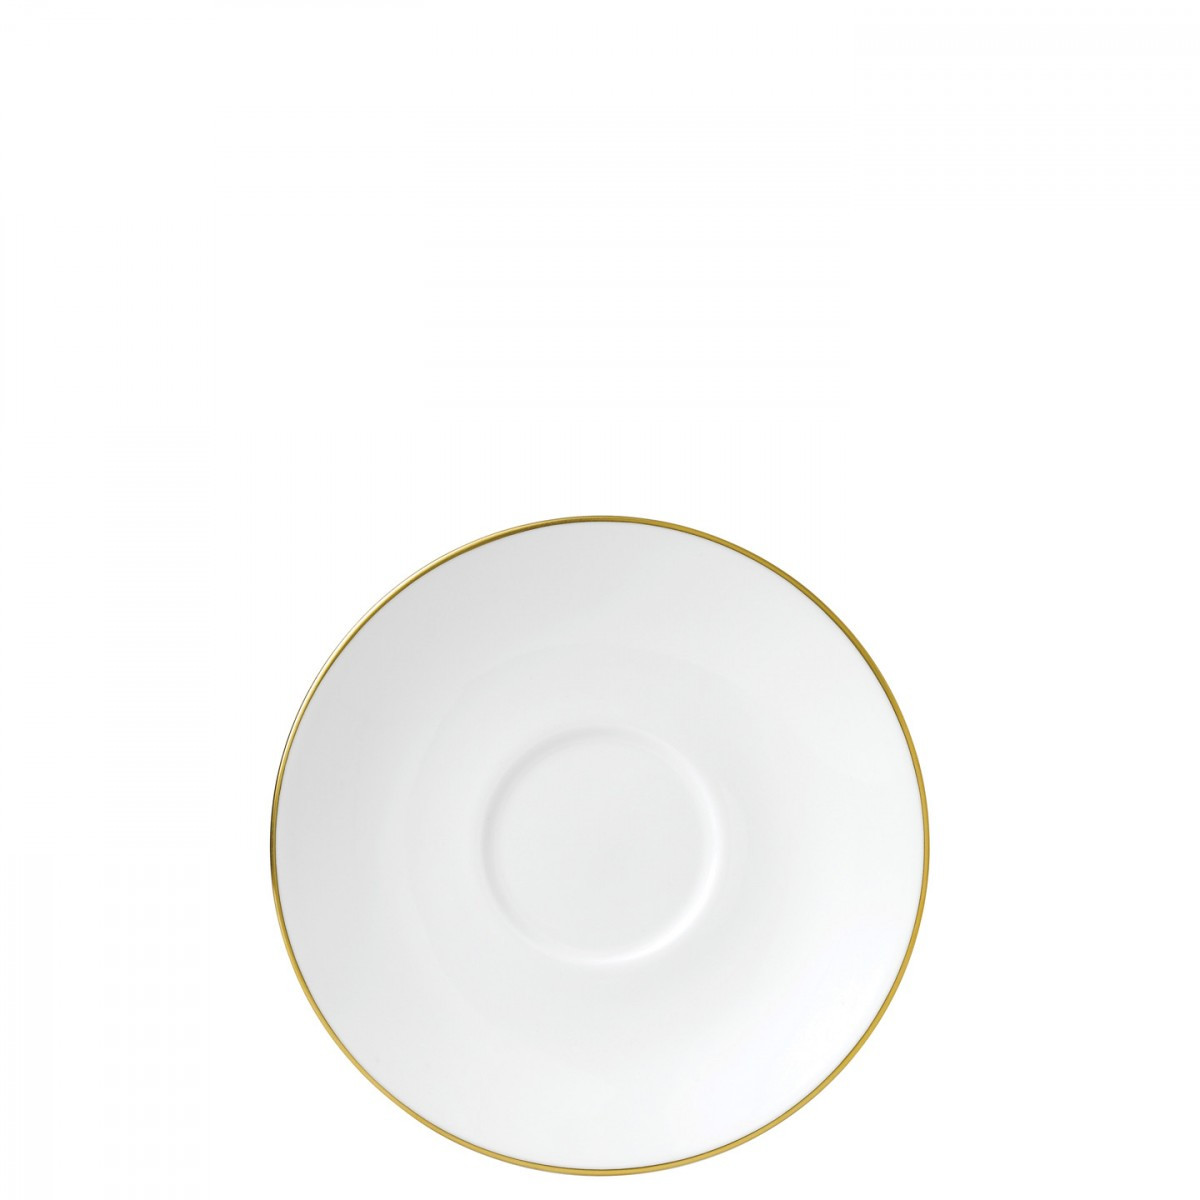 wedgwood bone china wild strawberry vase of wedgwood jasper conran gold tip tea saucer wedgwooda uk pertaining to jasper conran gold tip tea saucer